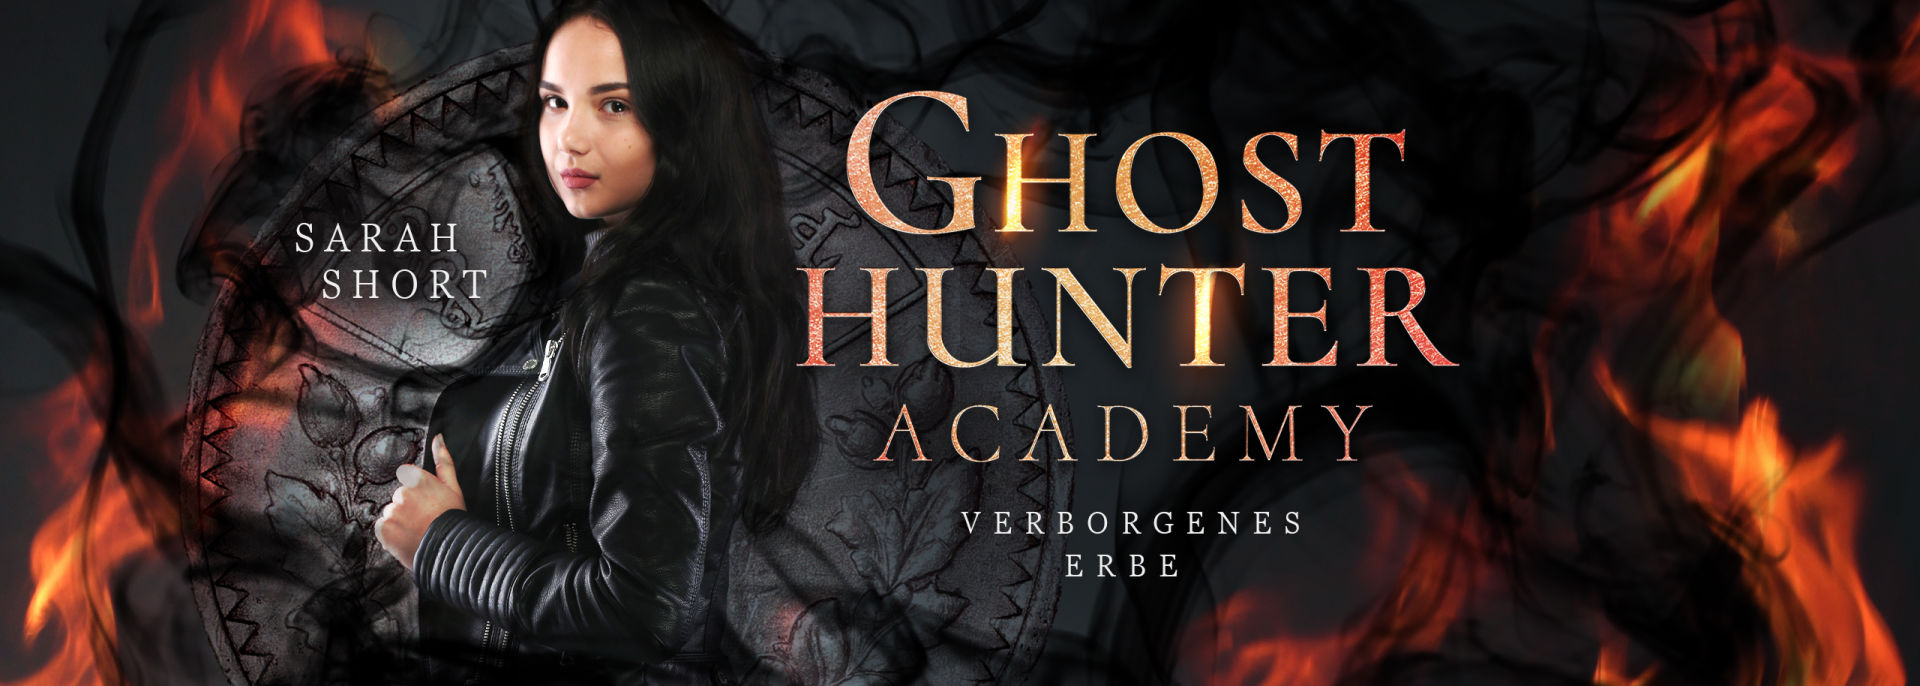 Ghost Hunter Academy